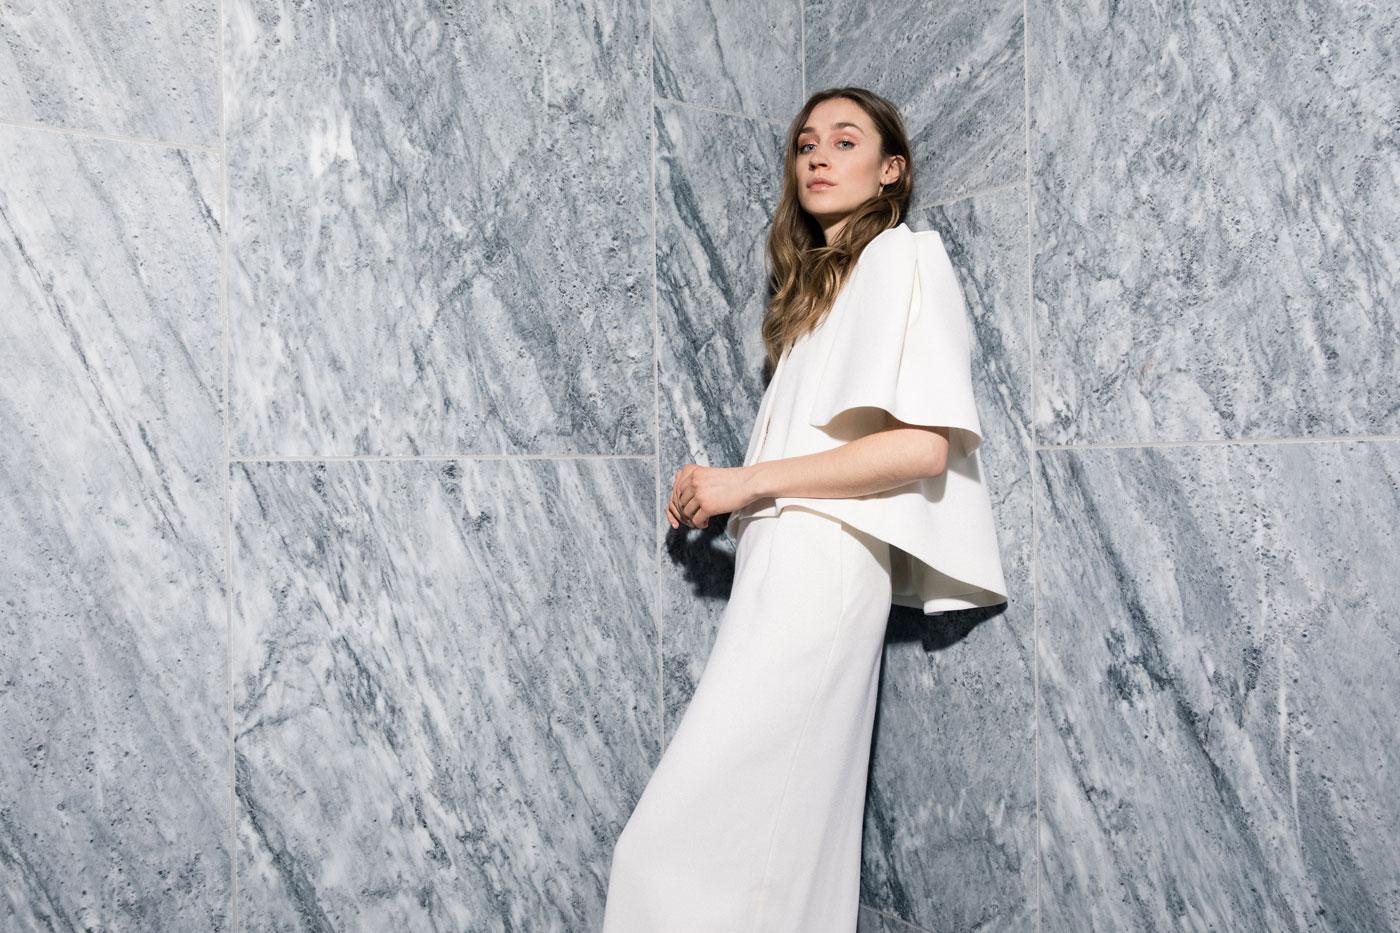 Maria Fekih wedding dress and jacket with pockets, modern bride